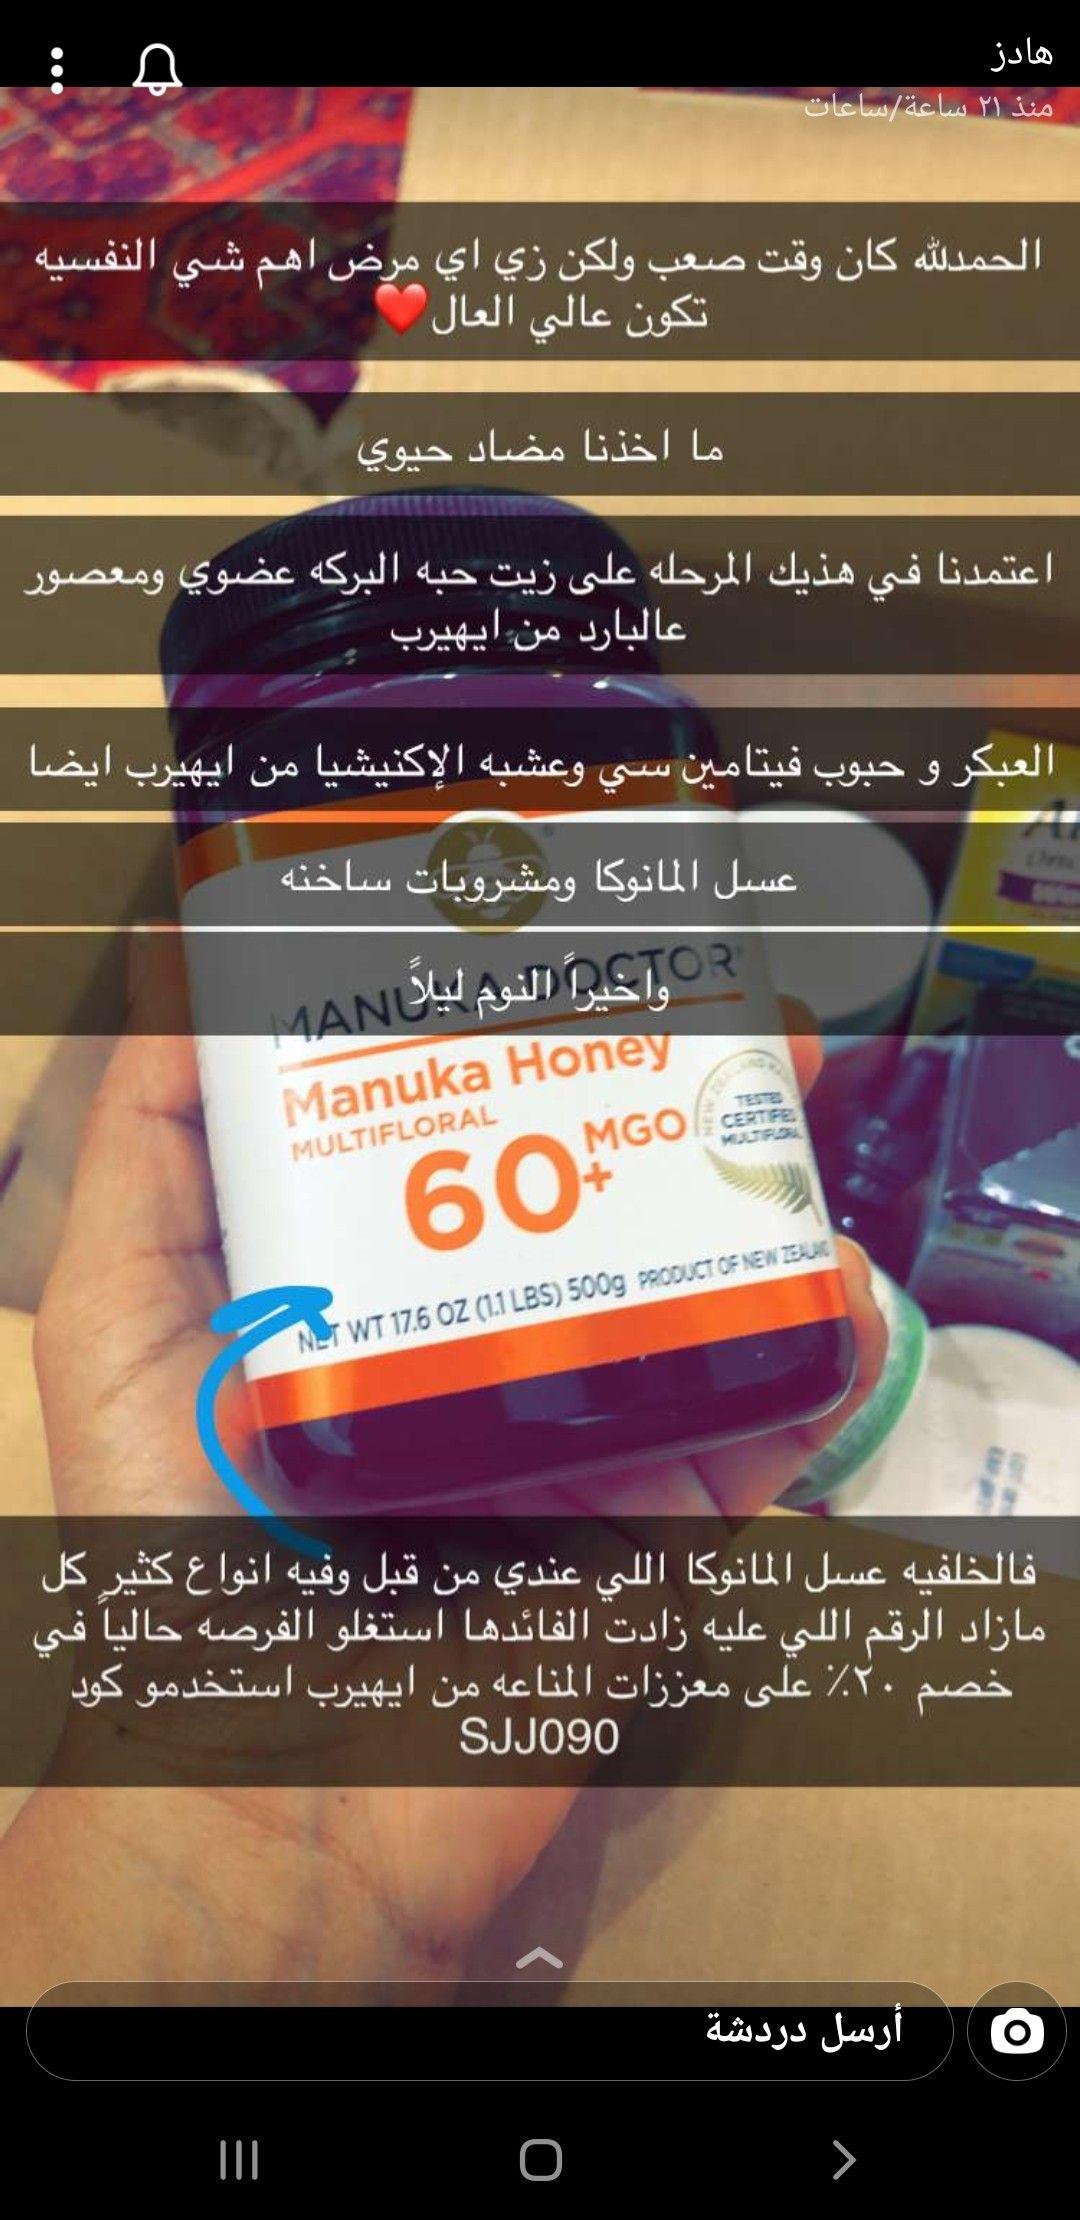 Pin By Aman On تغذية علاجية المعدة بيت الداء و الدواء توعية Arabic Food Health Manuka Honey